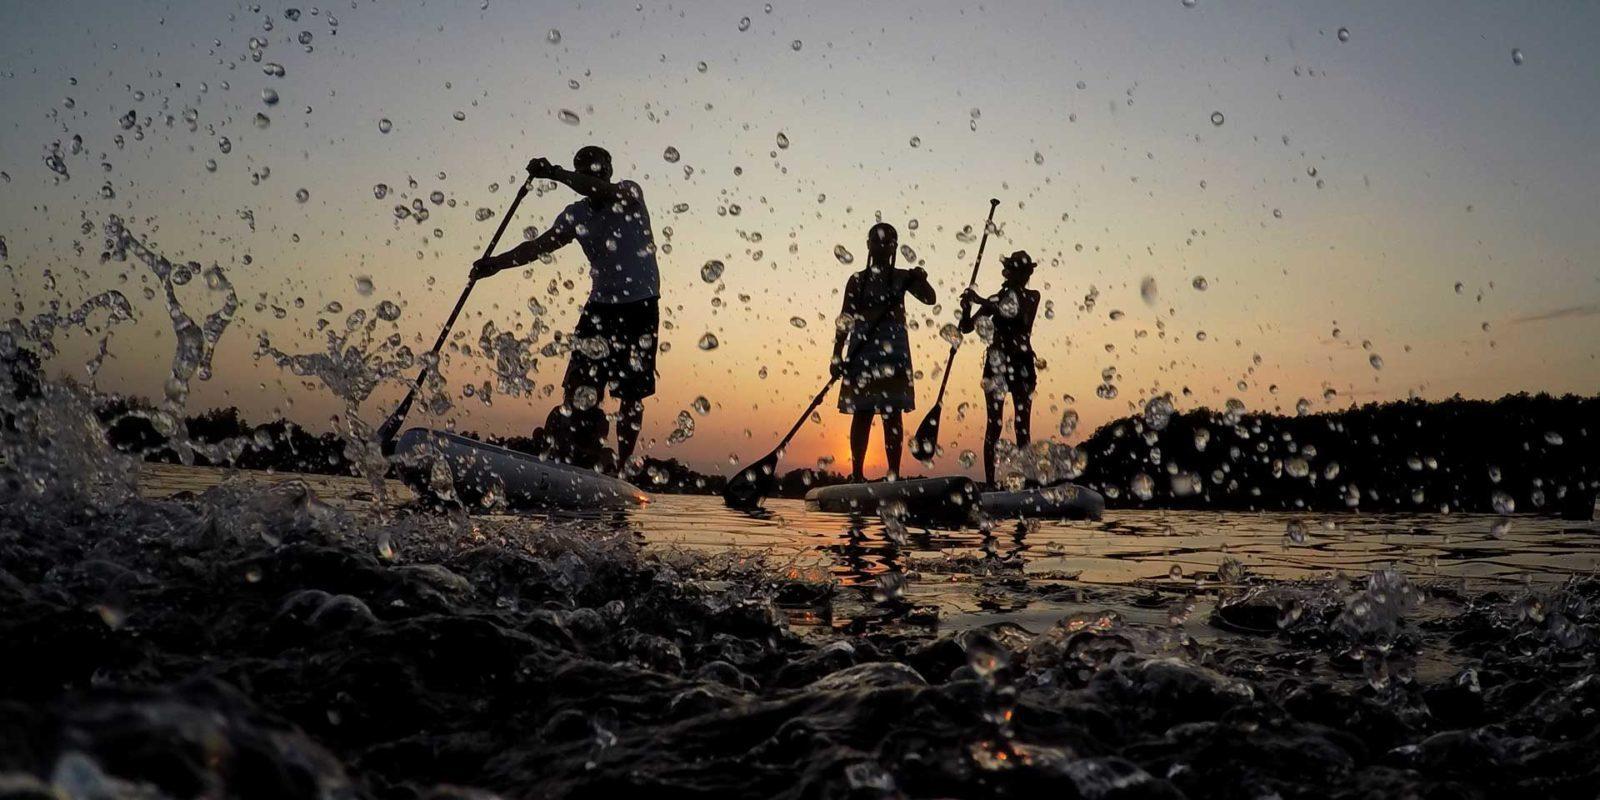 GTS-Paddleboards-Surfen-Sonnenuntergang-Meer